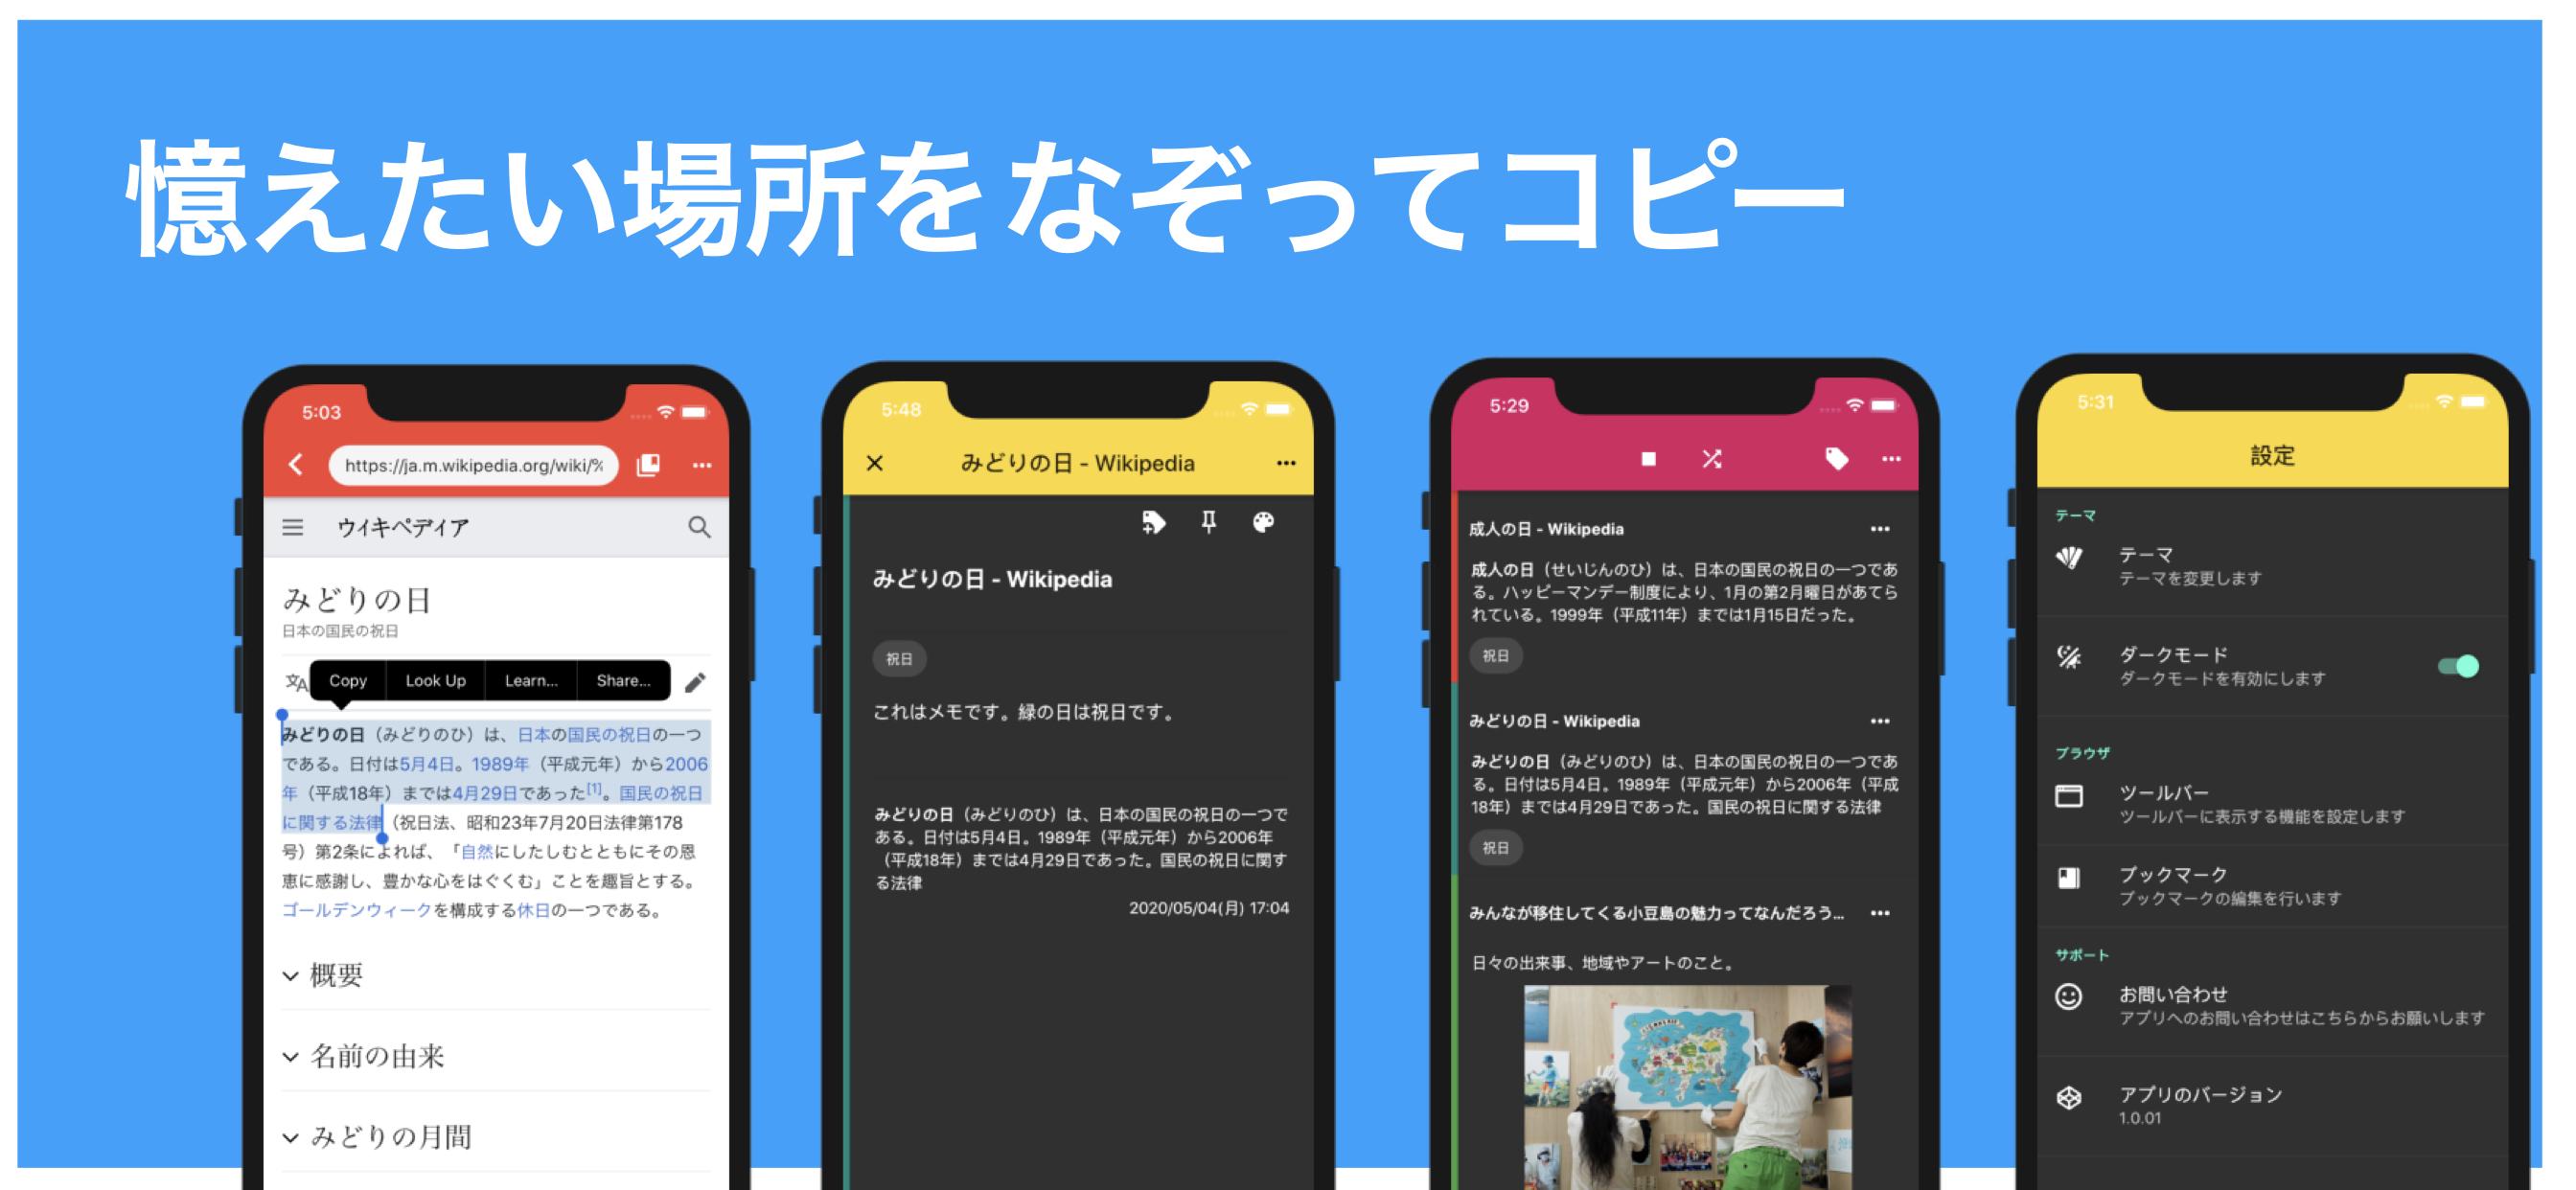 iphone11.004.jpeg